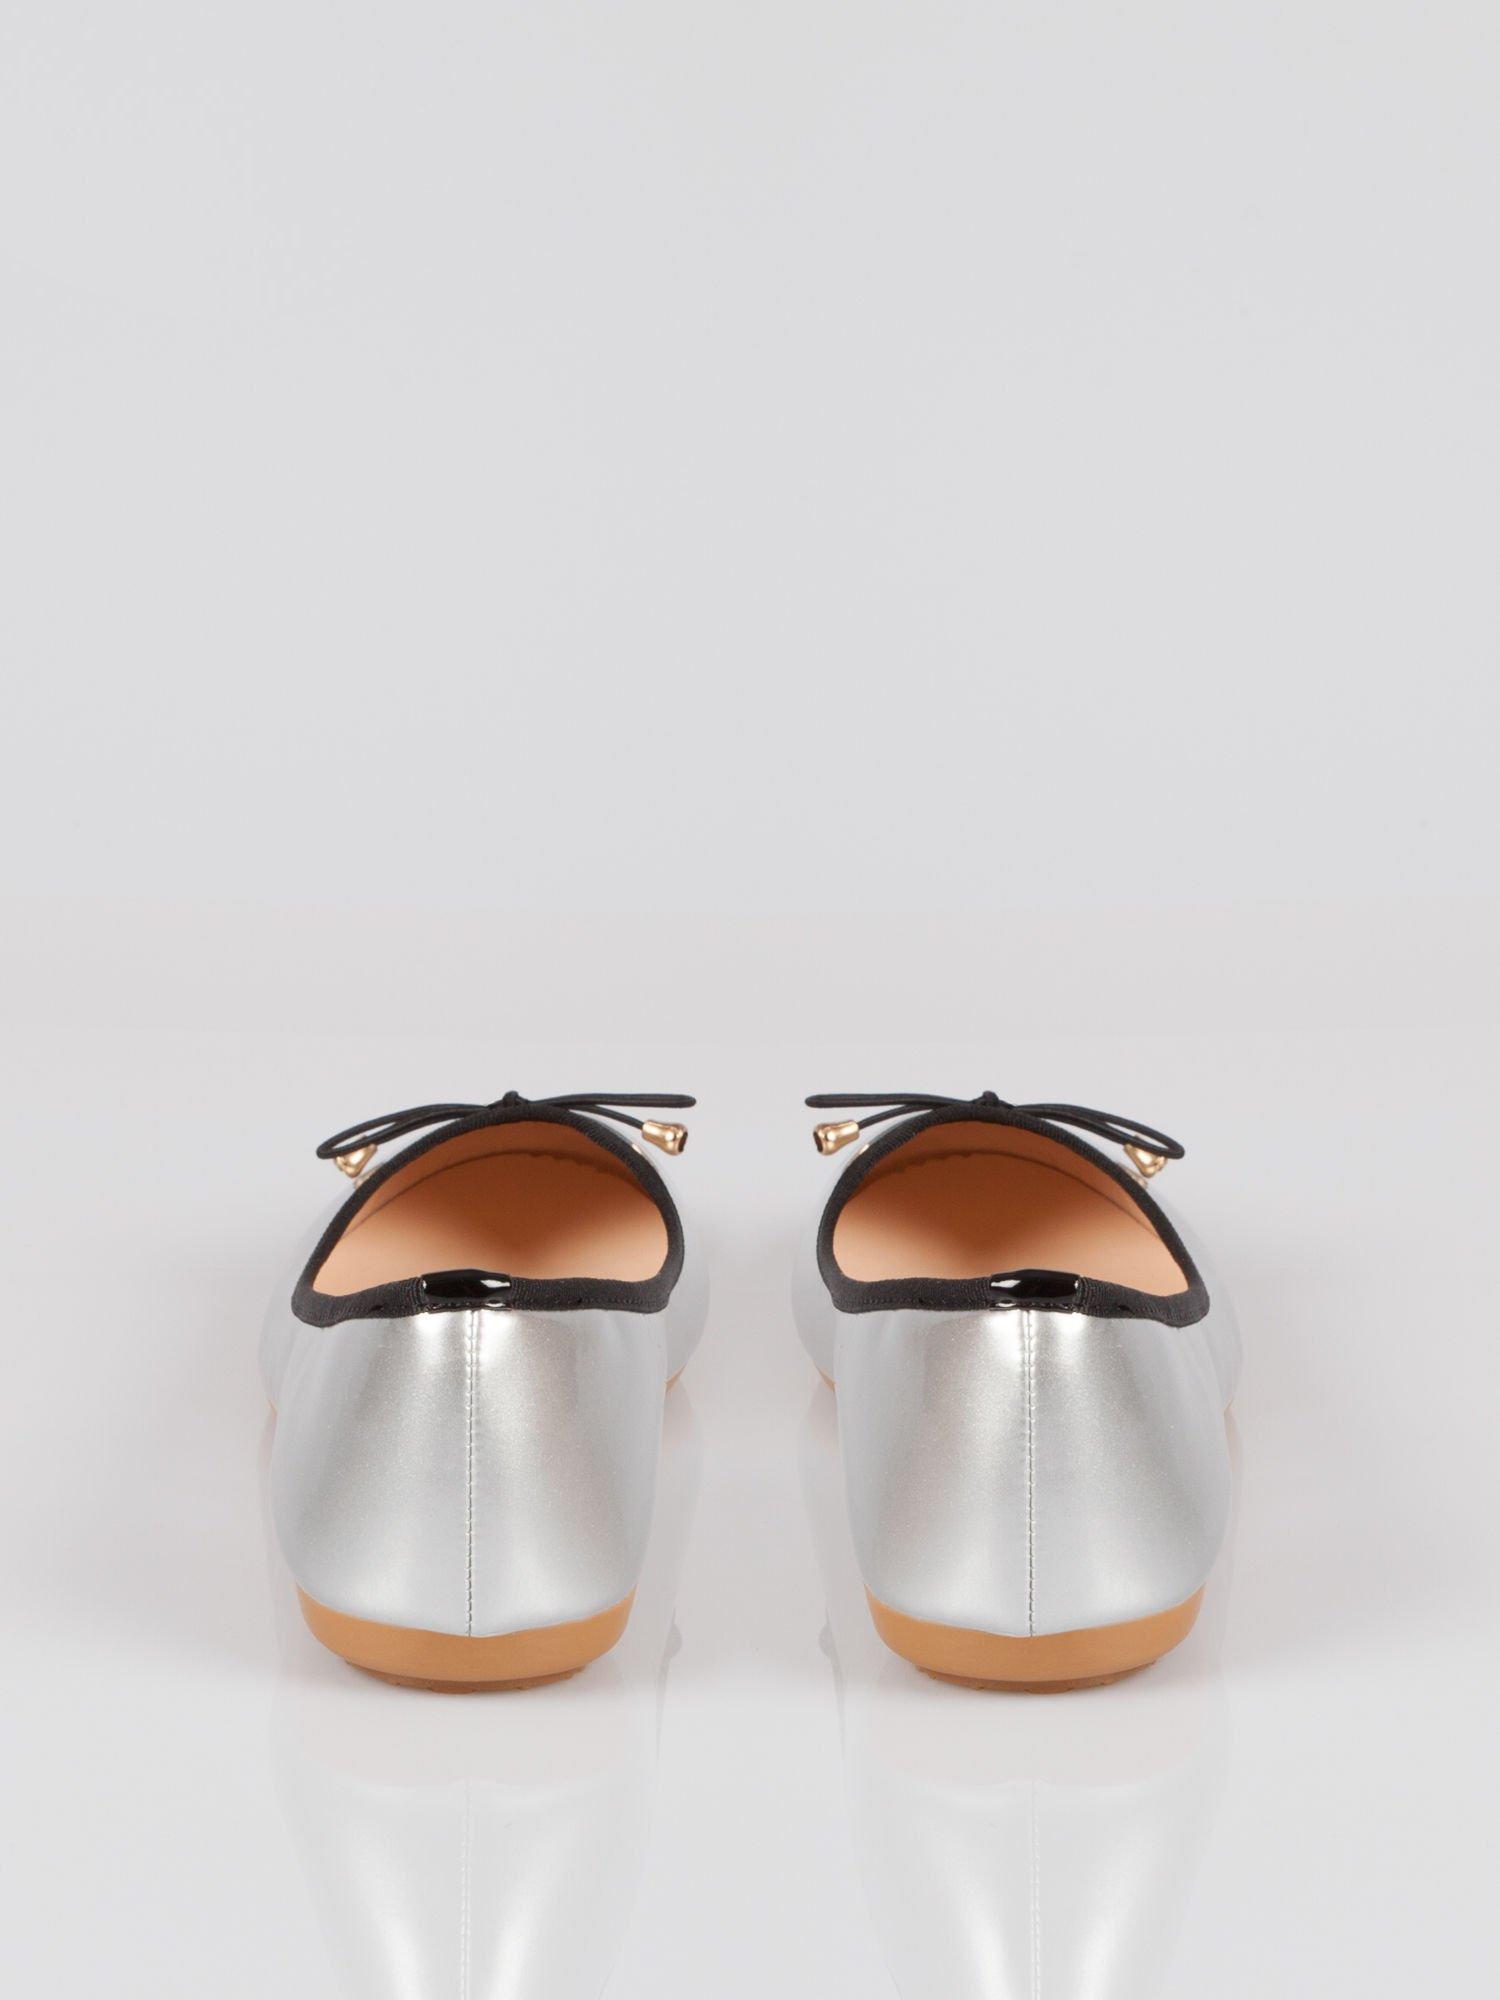 Srebrne baletki faux leather Evy z czarną kokardką i lamówką                                  zdj.                                  2